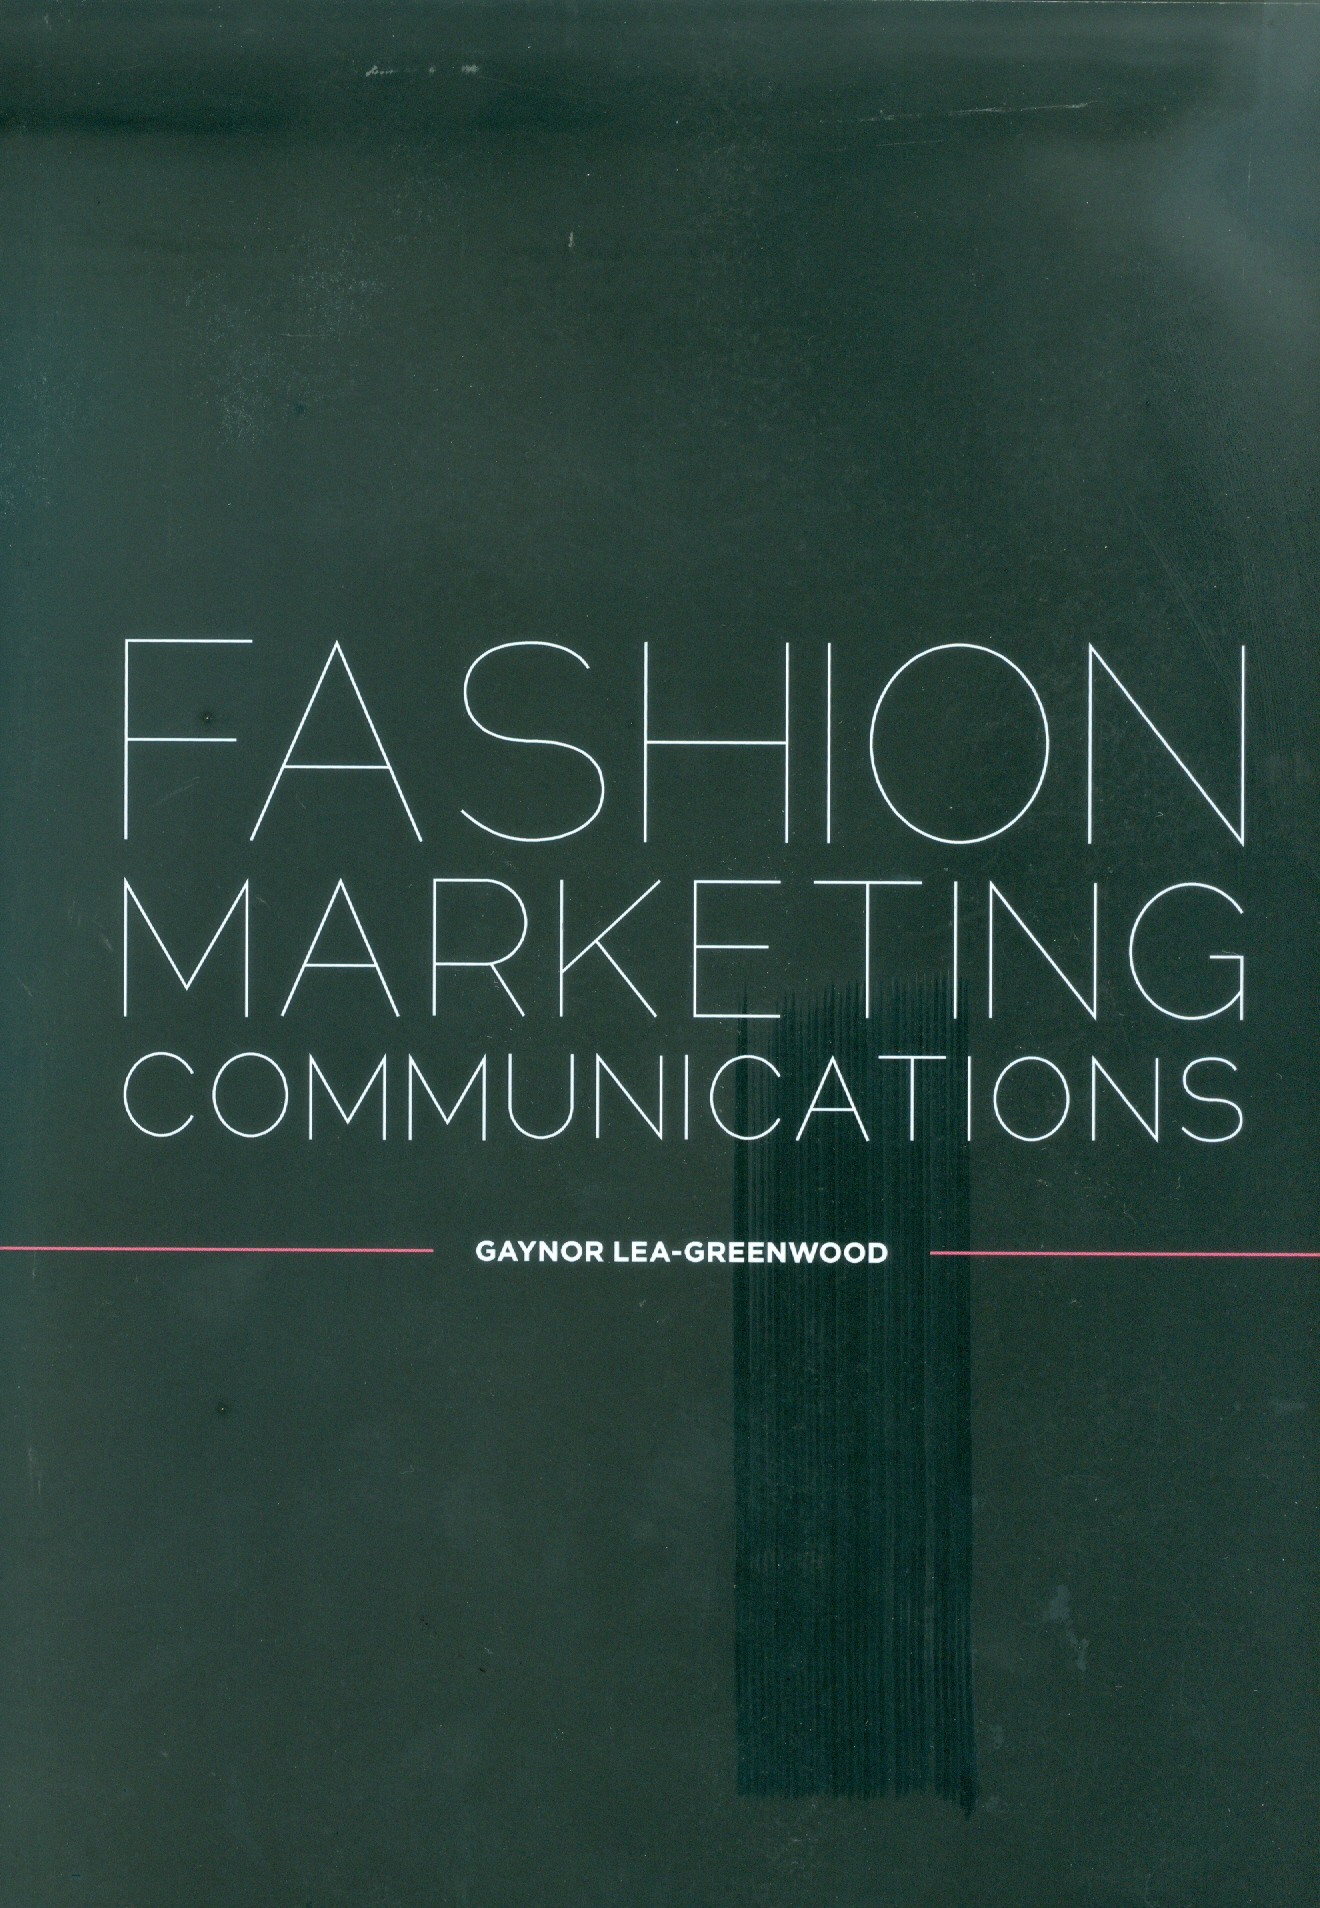 Fashion Marketing Communications0001.jpg